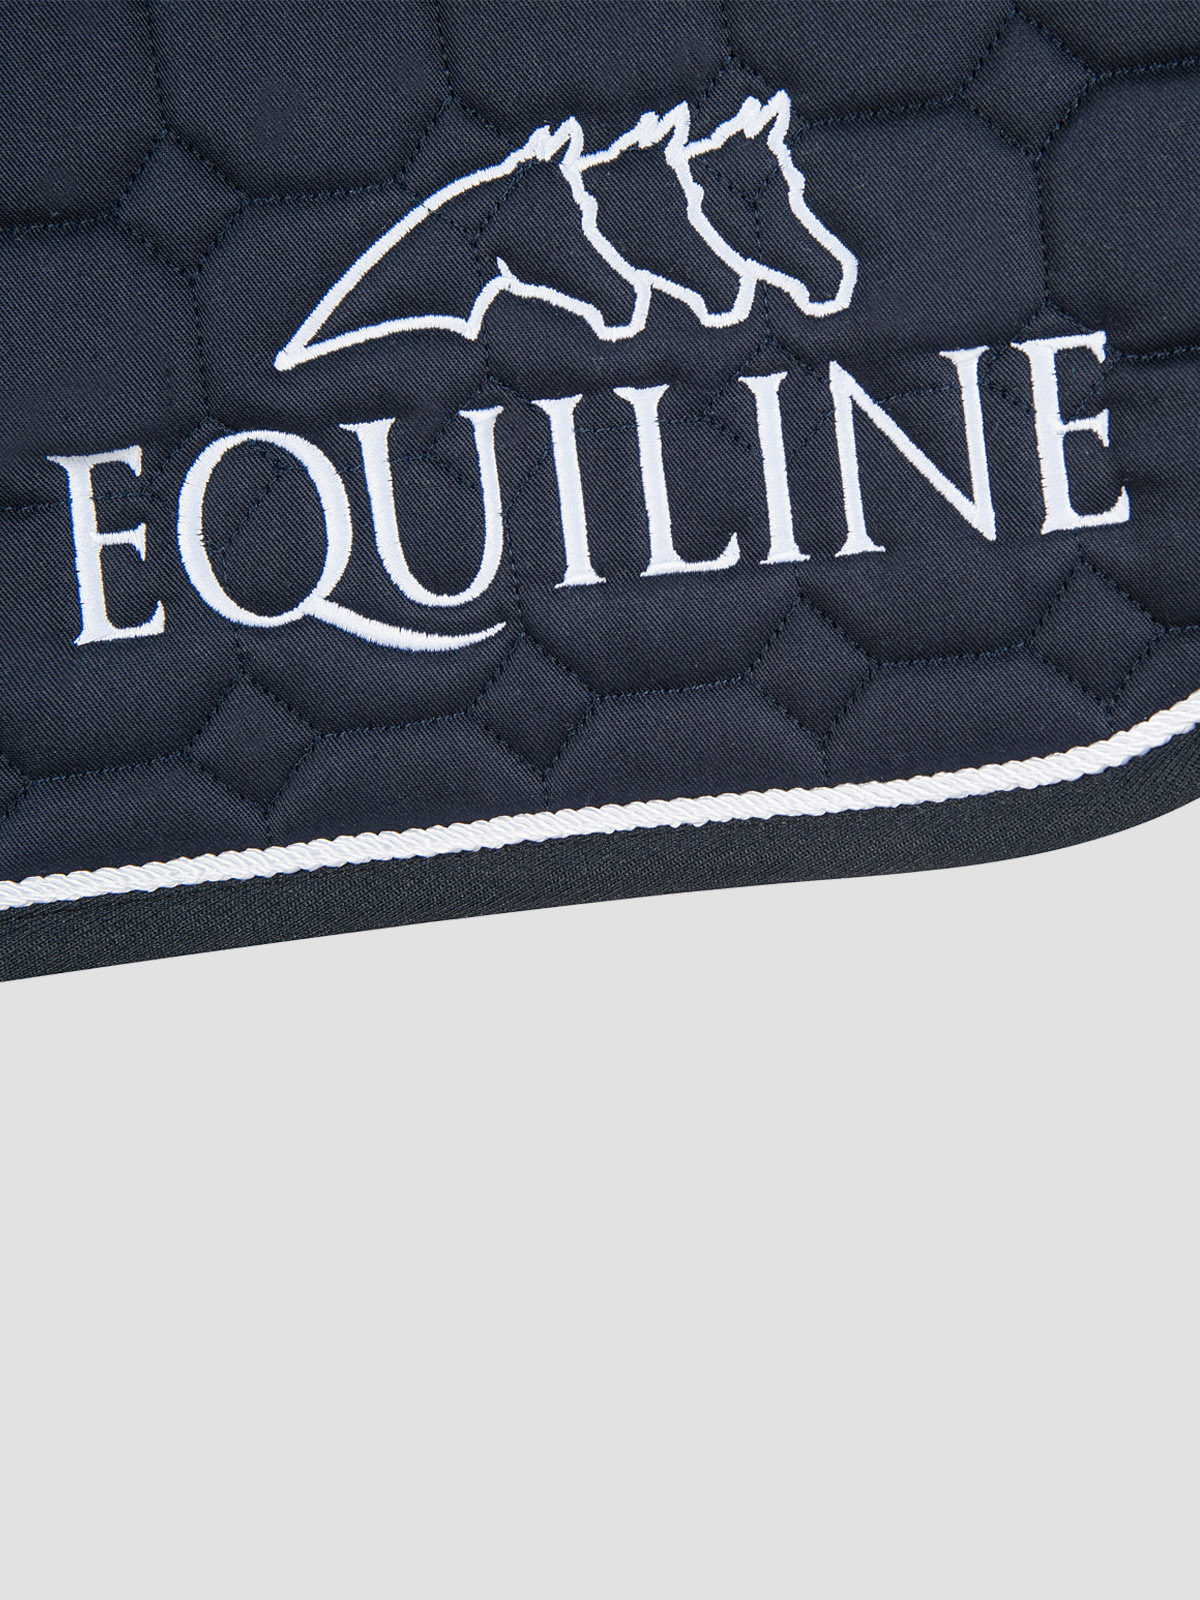 OUTLINE - Octagon Saddle Pad w/ Logo 2